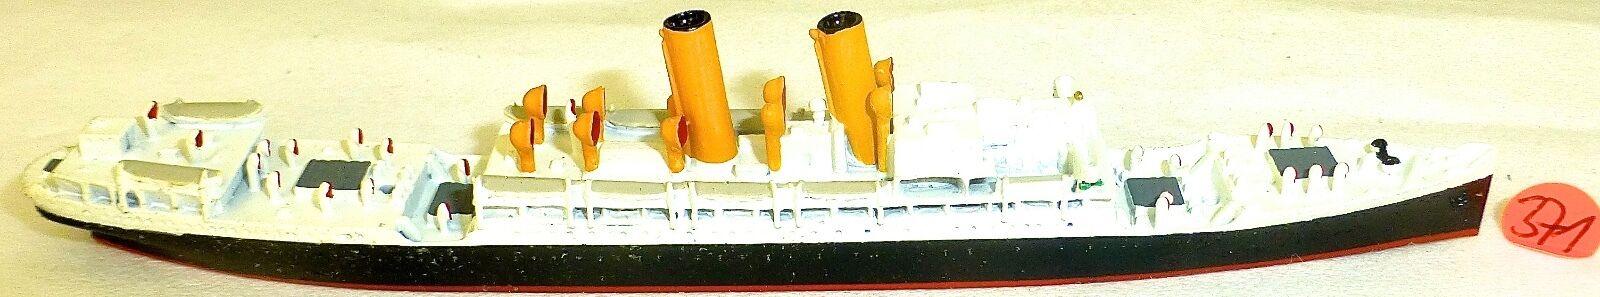 Prinz Eitel Friedrich Cottura Vapore Mercator M425 Modello Barca 1 1250 SHP371 Å